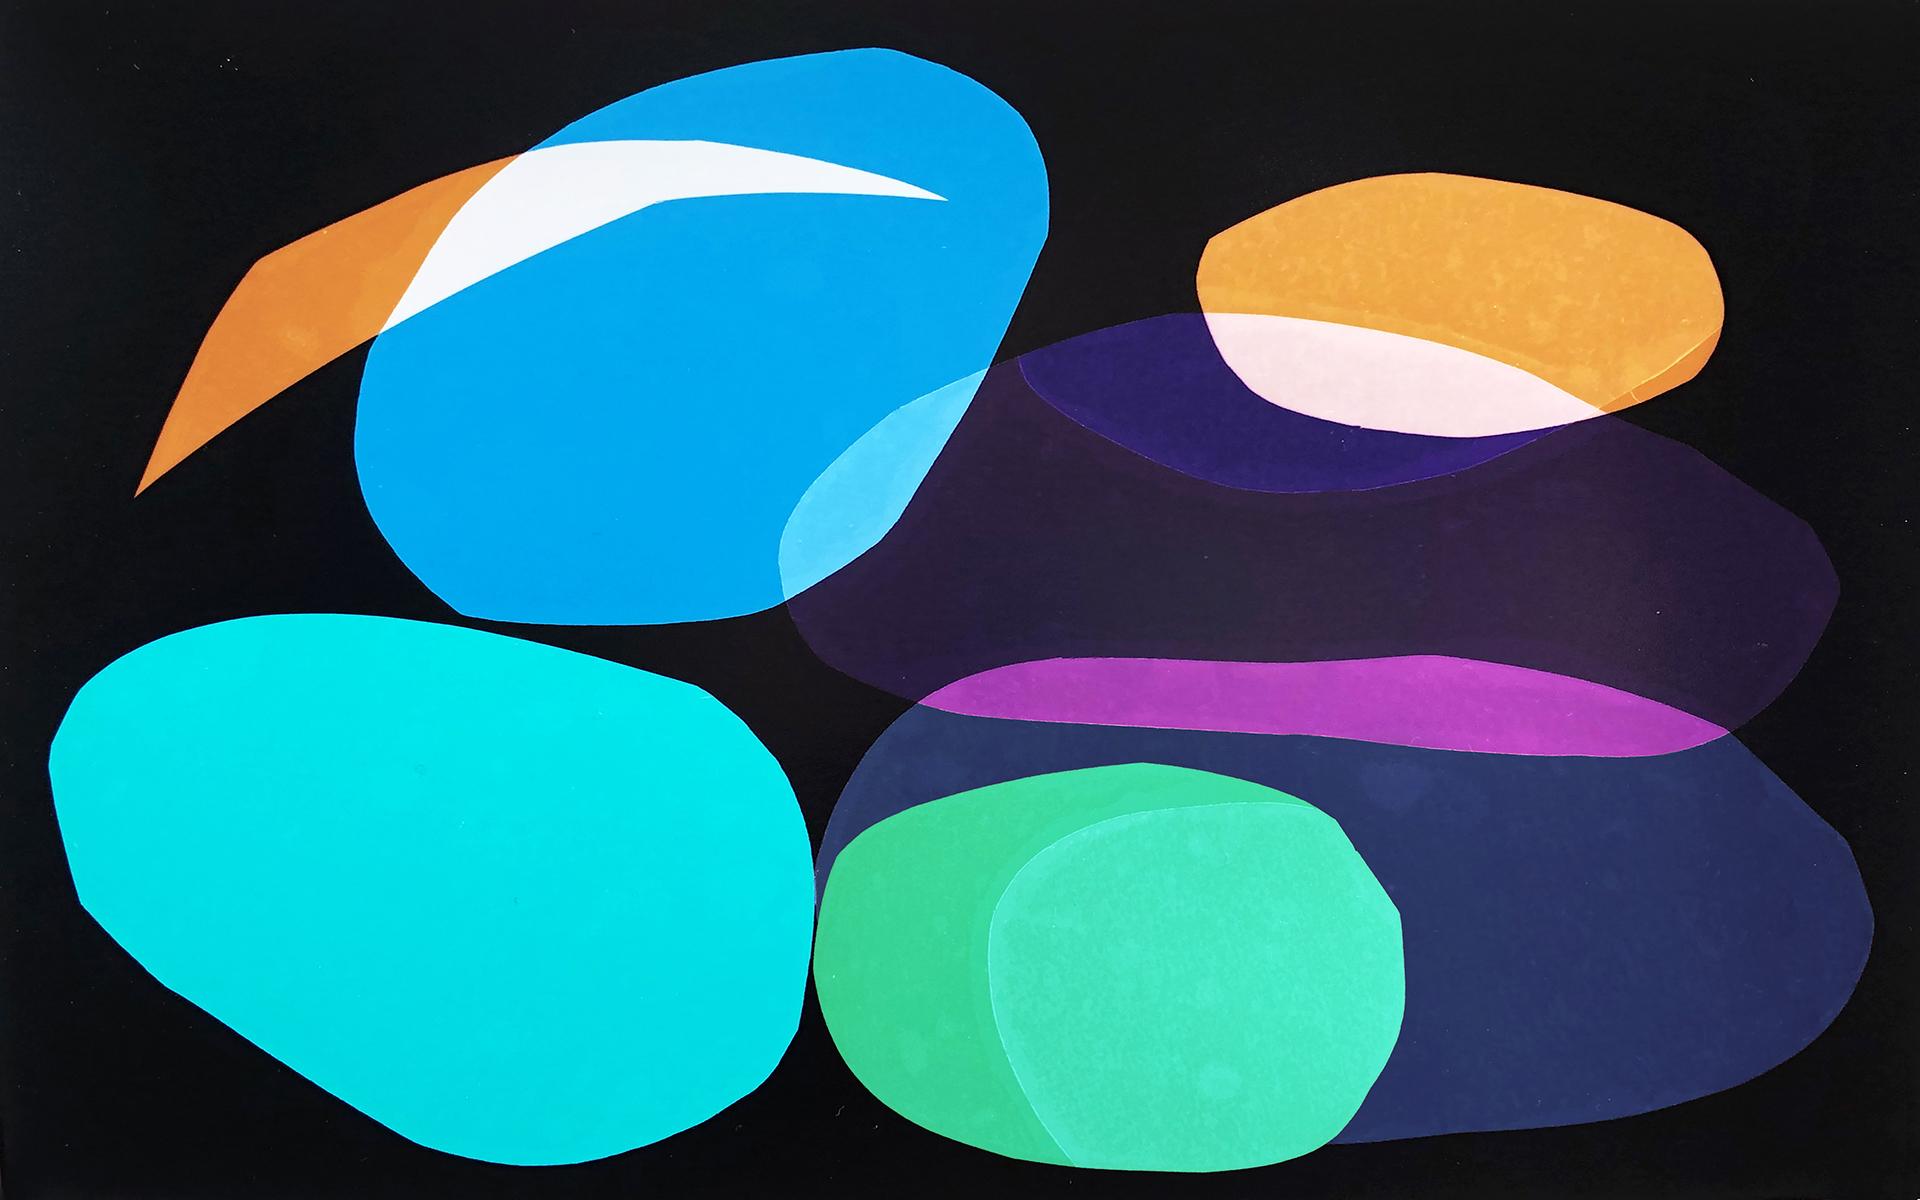 GoogleDesign_ArtDirectors_Canvas_03.jpg